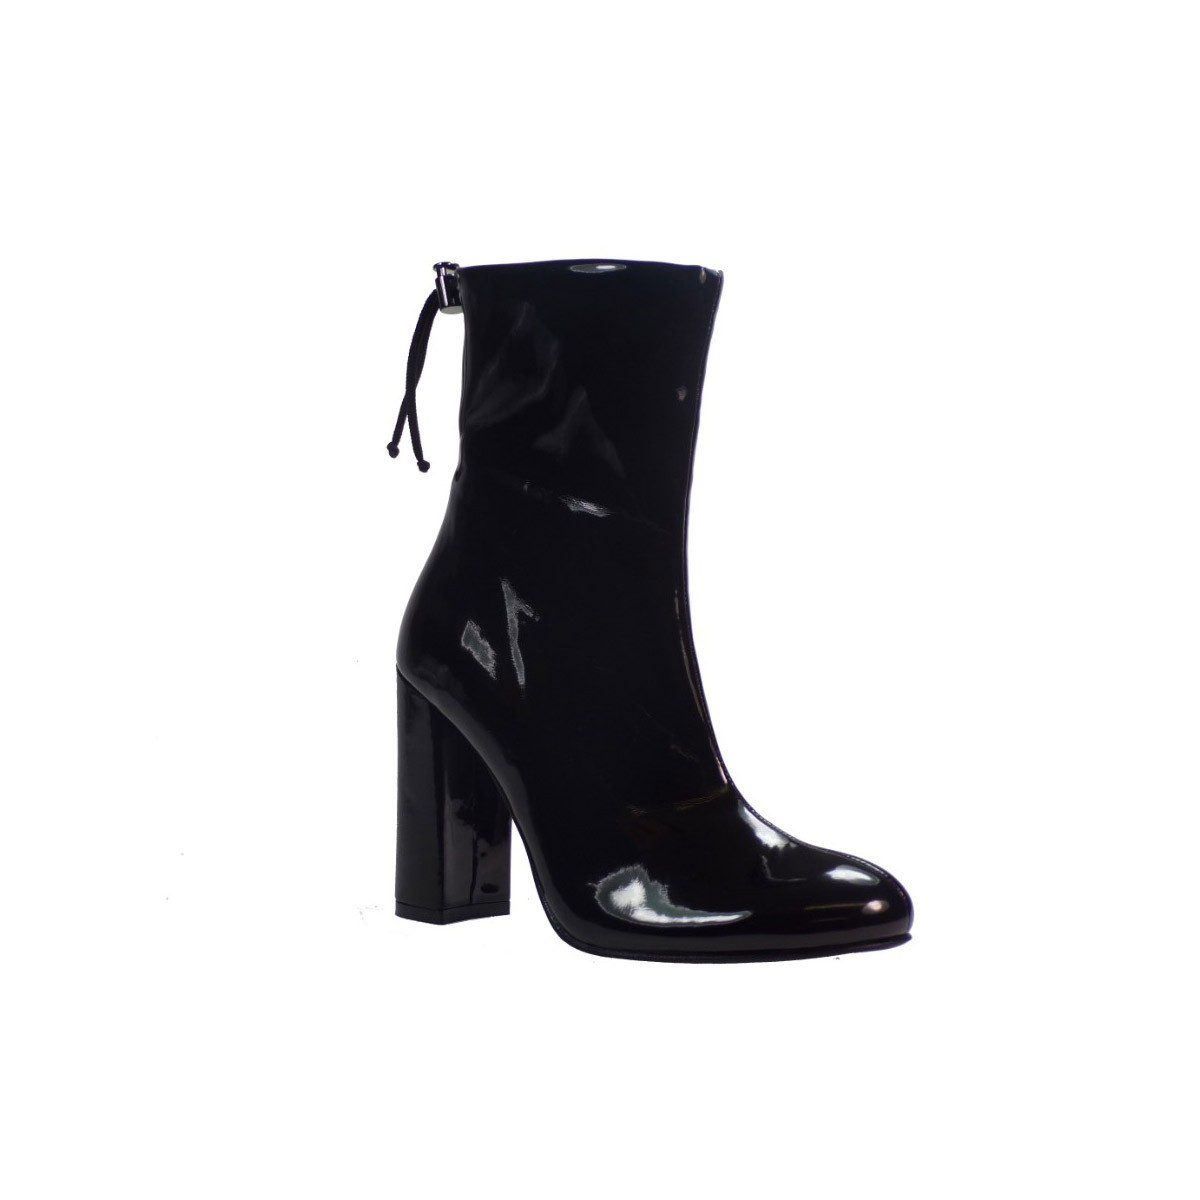 dc9e13dcd5b Katia Shoes Γυναικεία Mποτάκια 133/4942 Μαύρα Λουστρίνι Katia Shoes  133/4942 Μ BagiotaShoes